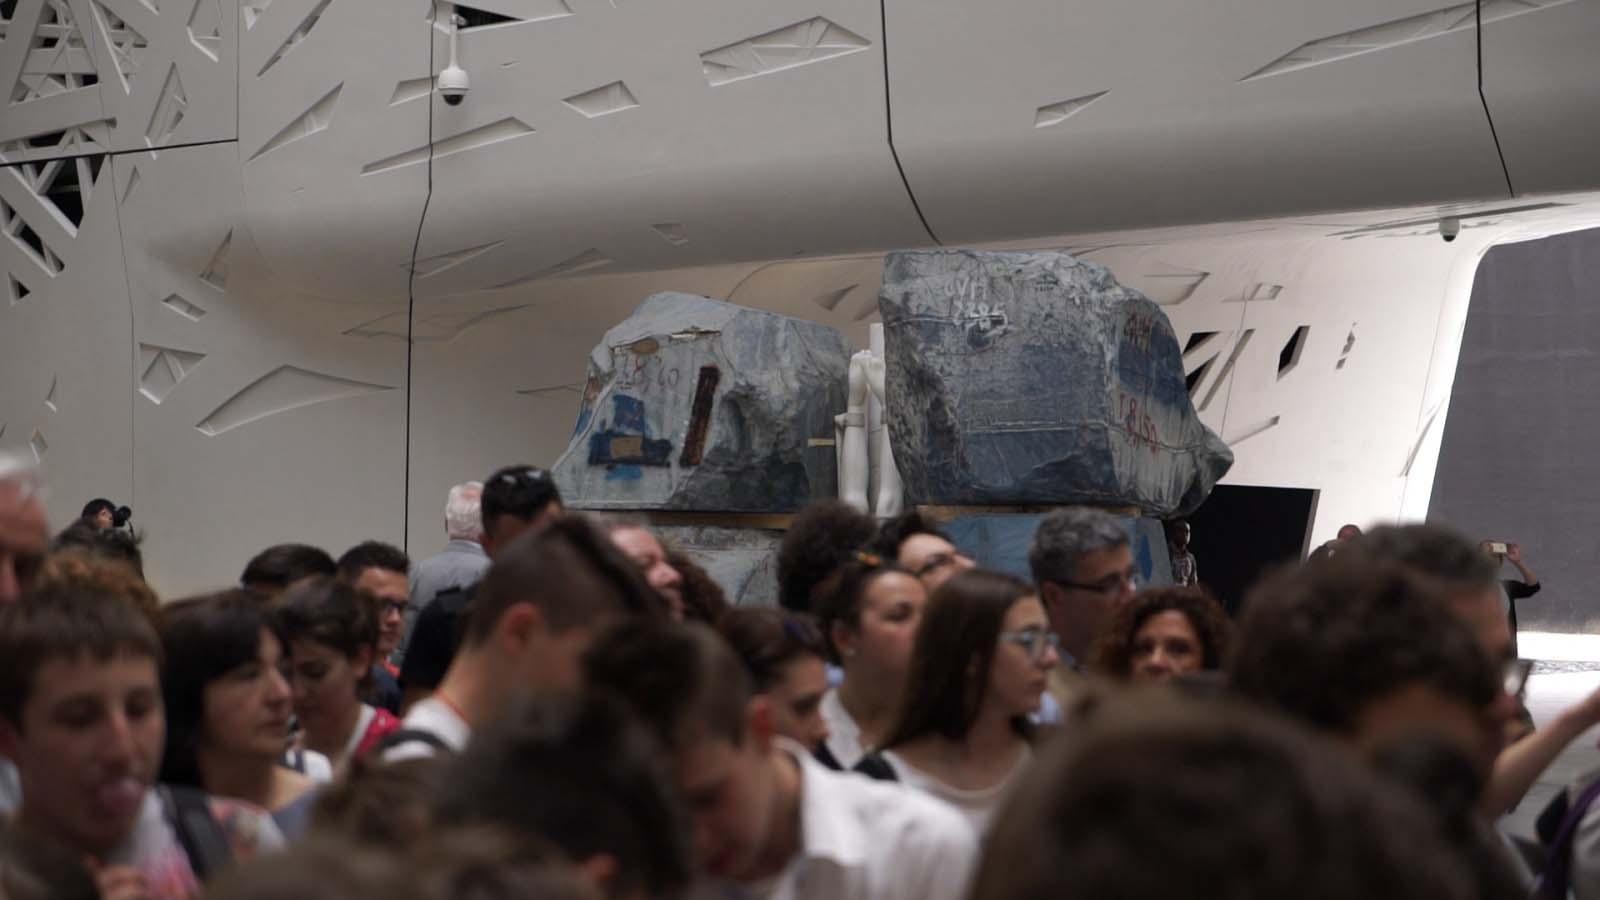 Argot ou La Maison Mobile - Vanessa Beecroft Expo 2015